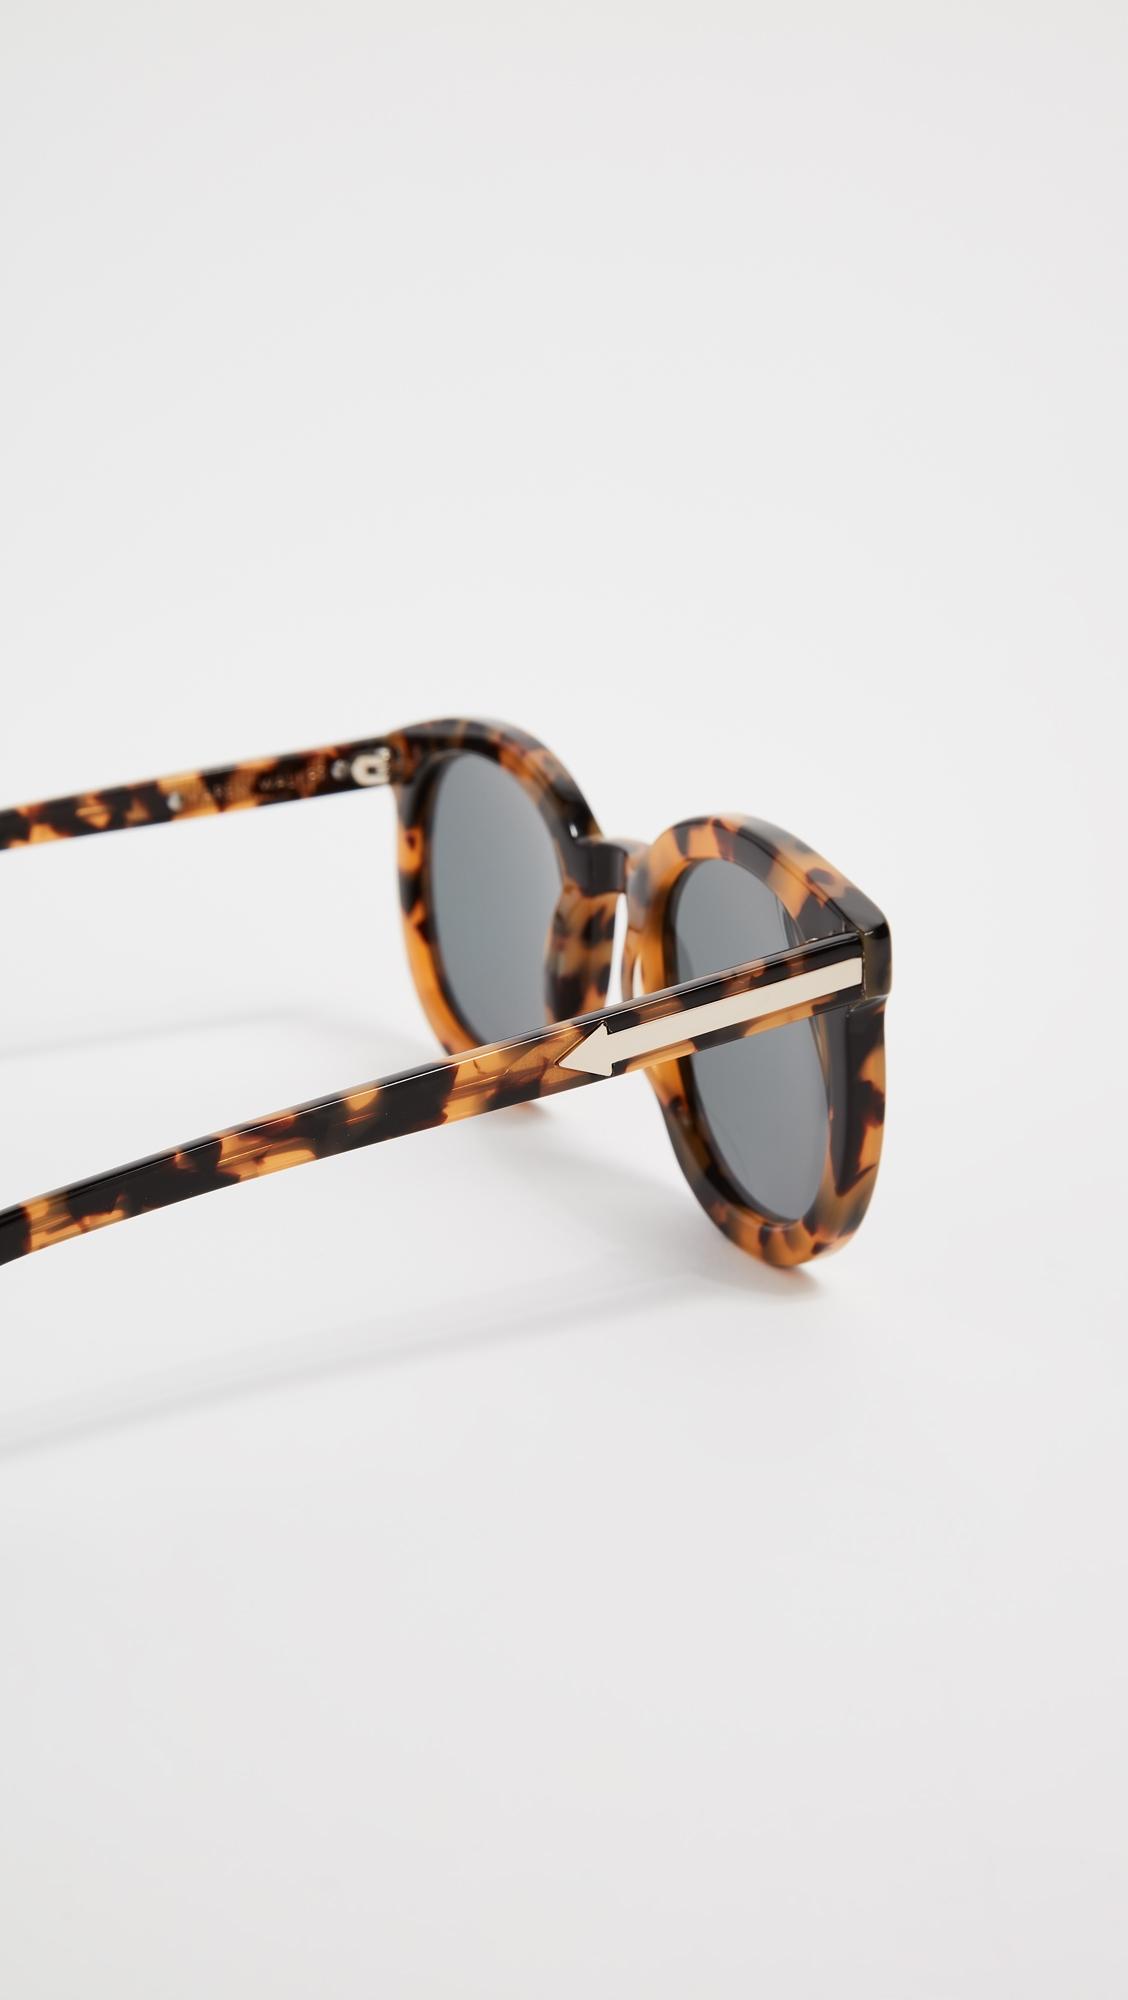 Солнцезащитные очки Super Duper Strength Karen Walker  (KWALK4003528436314)